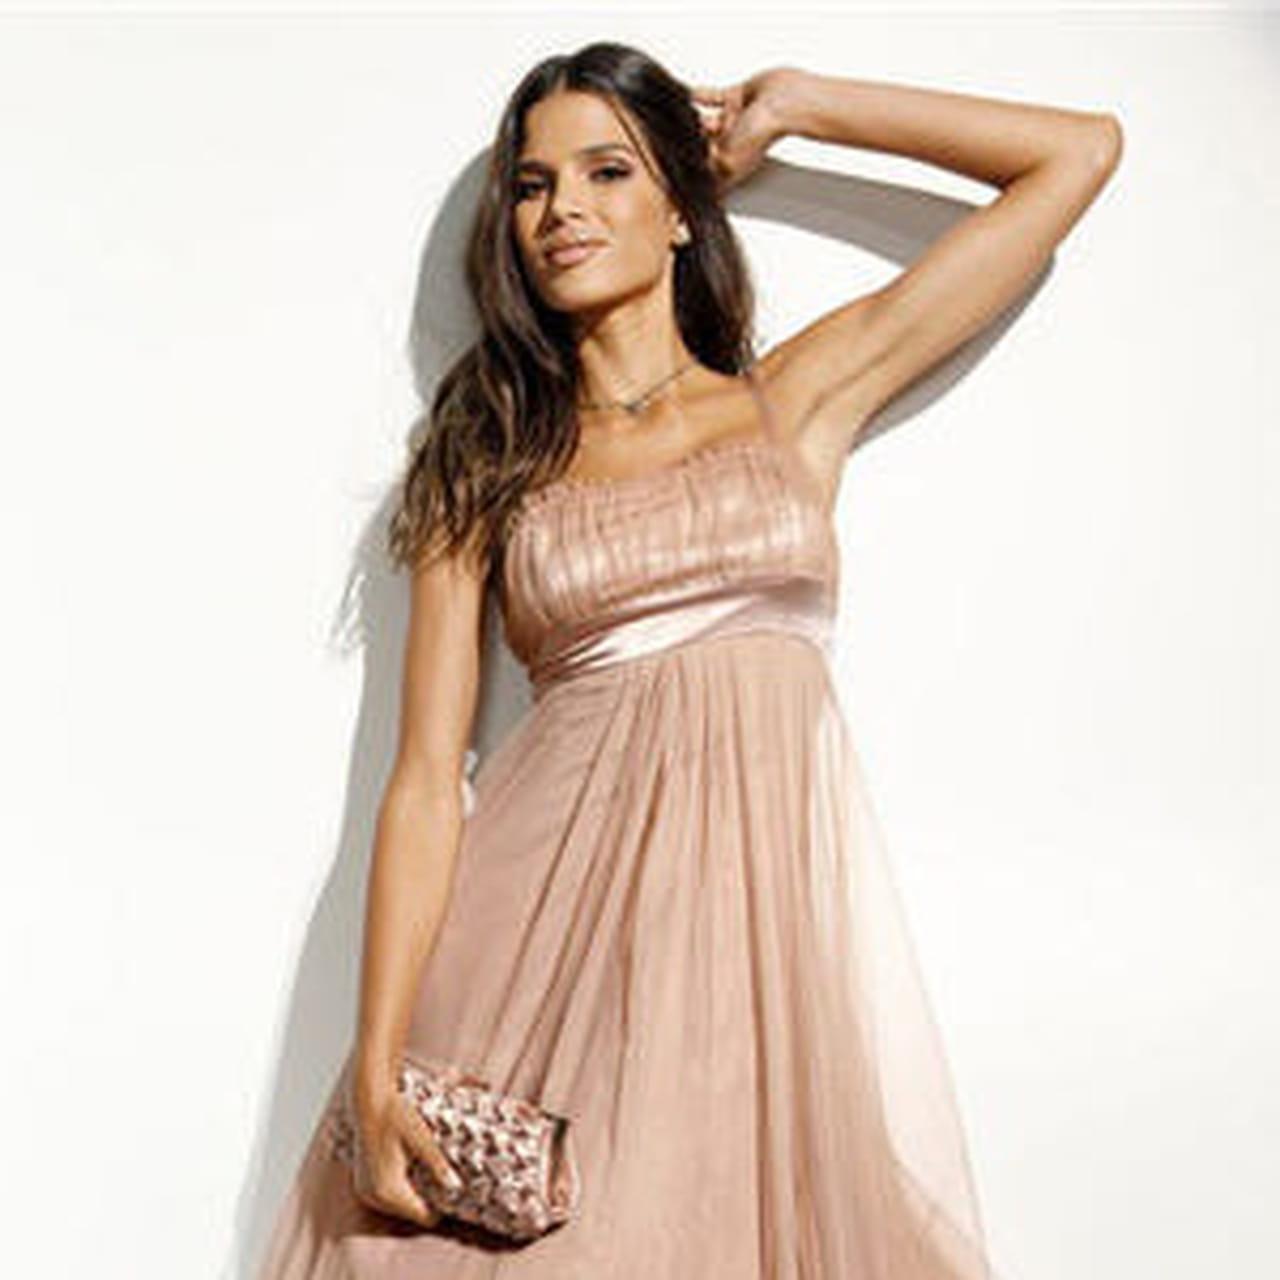 Look Fashion Femme Robes Noires Helline wPn8OX0k